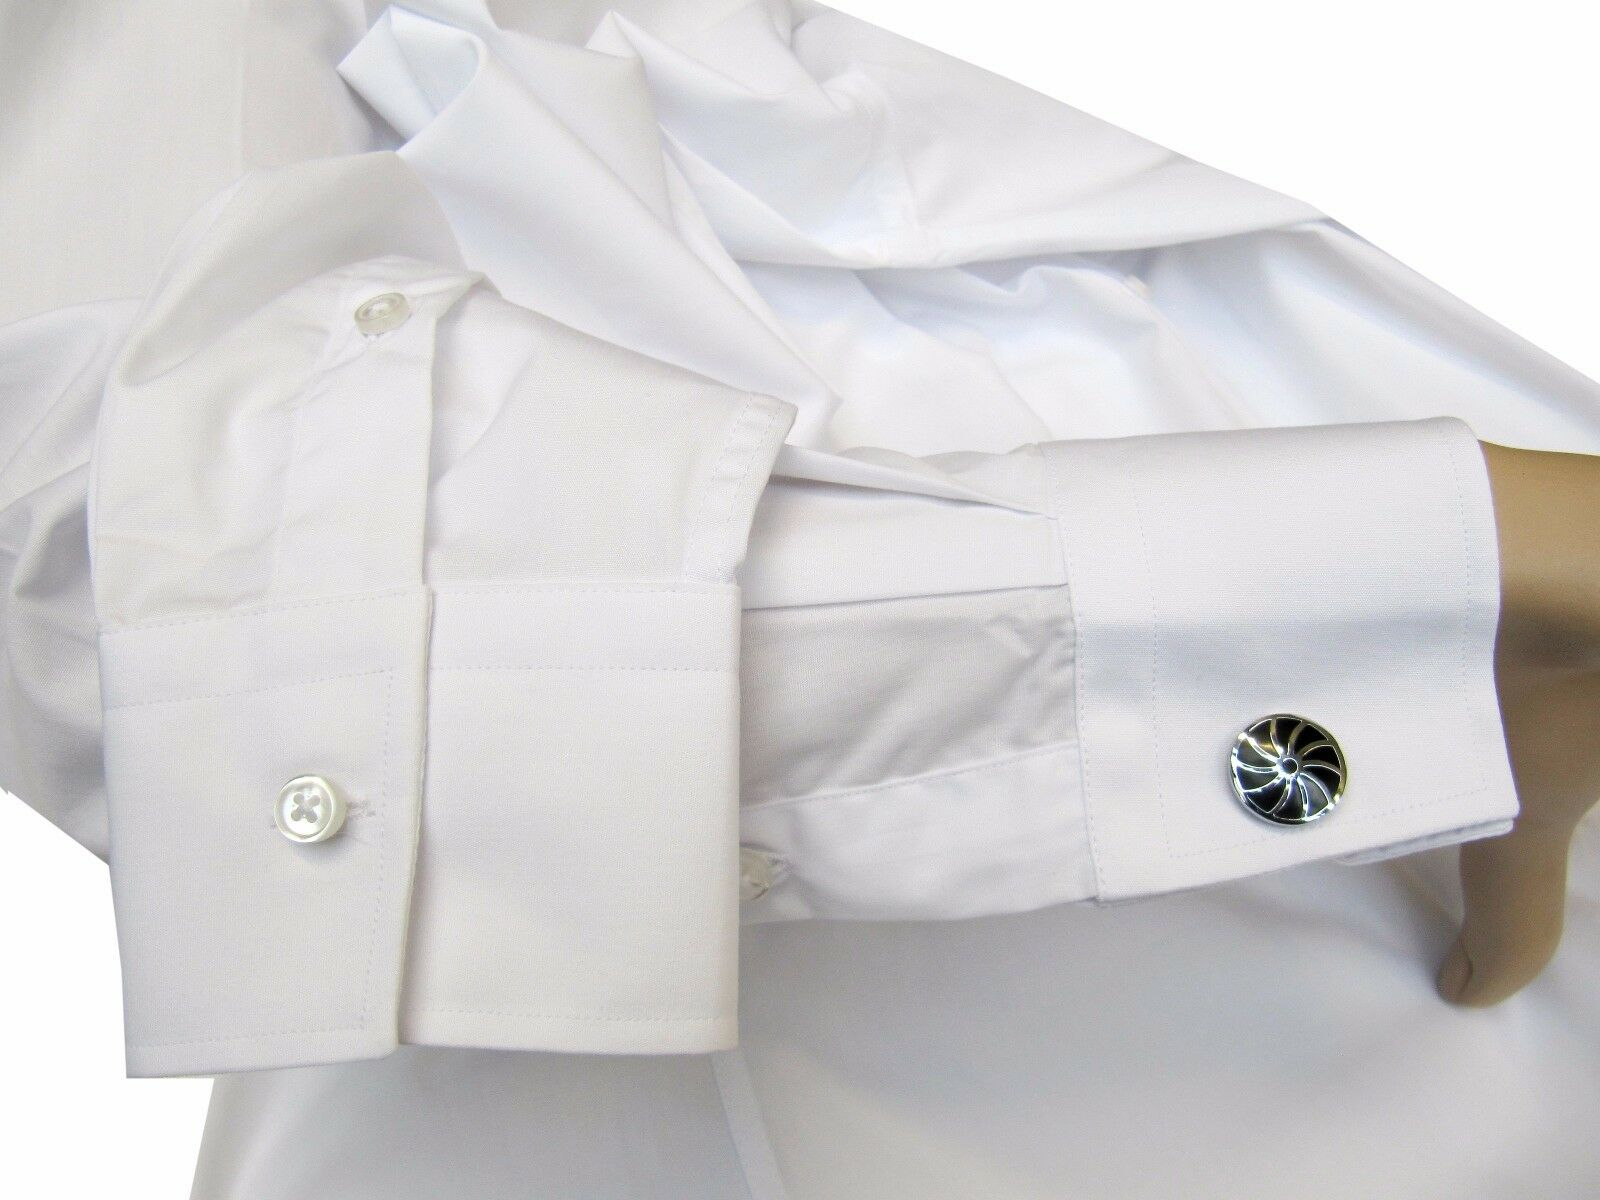 Herren Hemd extra lange Arme Arme Arme Gr.S Grau 37 38 | Günstige Bestellung  | Gutes Design  9133d3